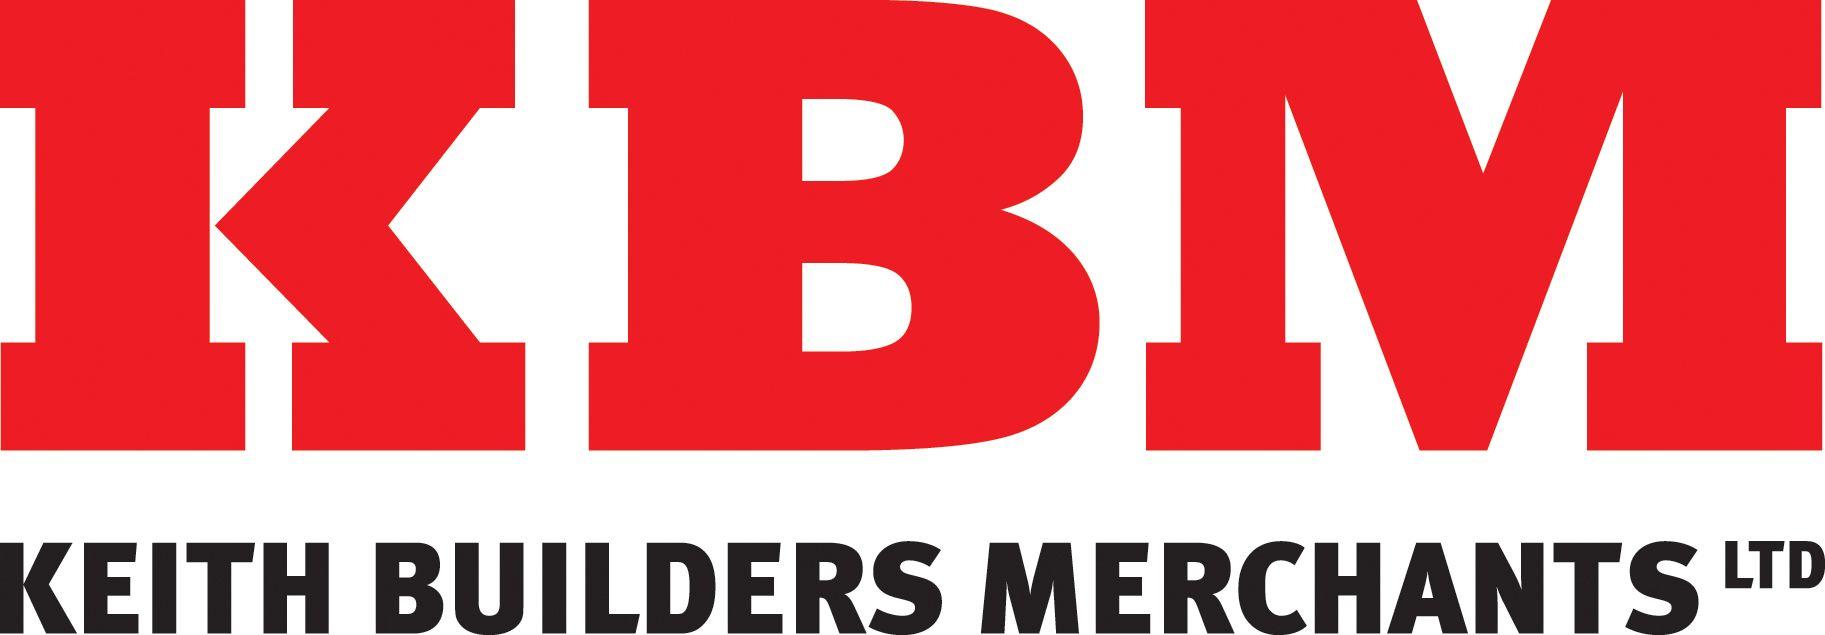 Read Keith Builders Reviews